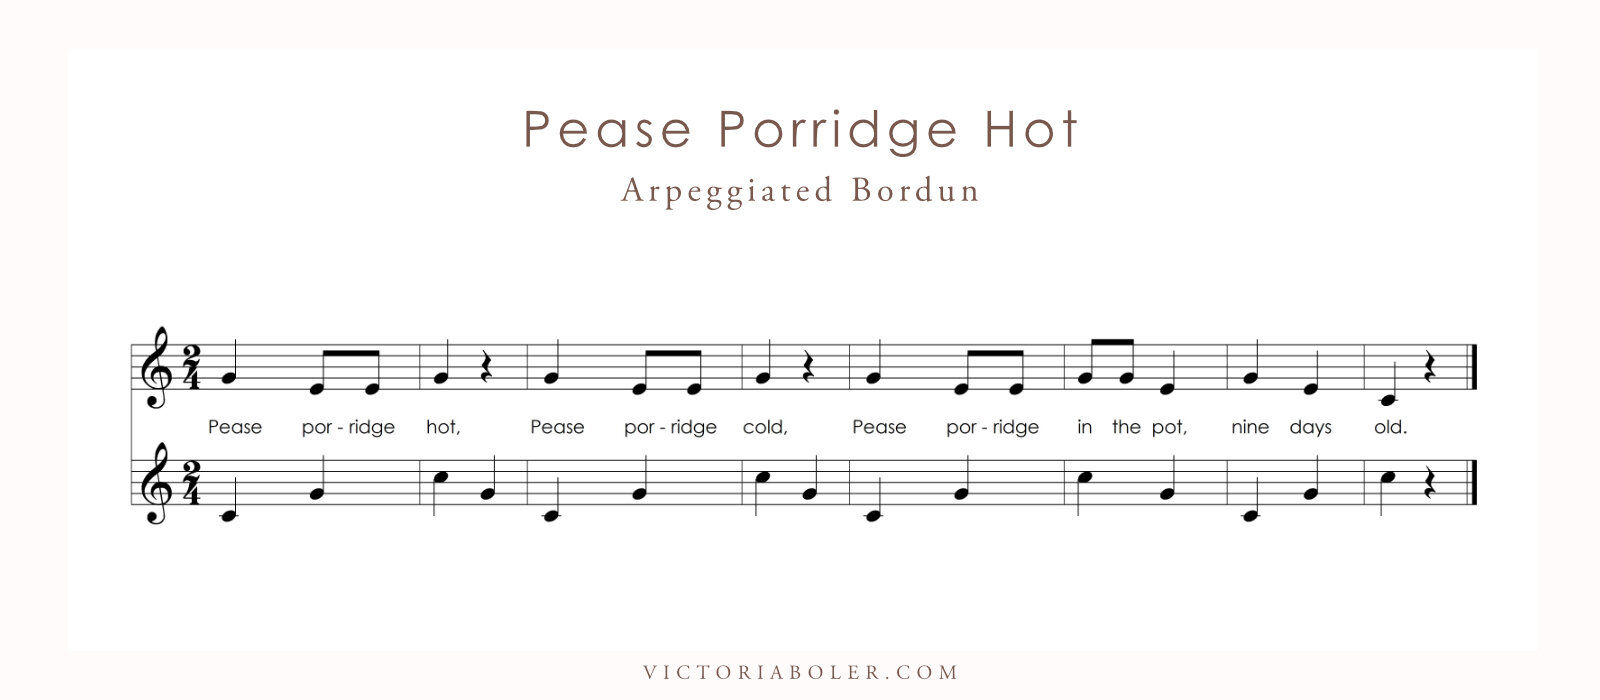 Pease Porridge Hot Arpeggiated Bordun